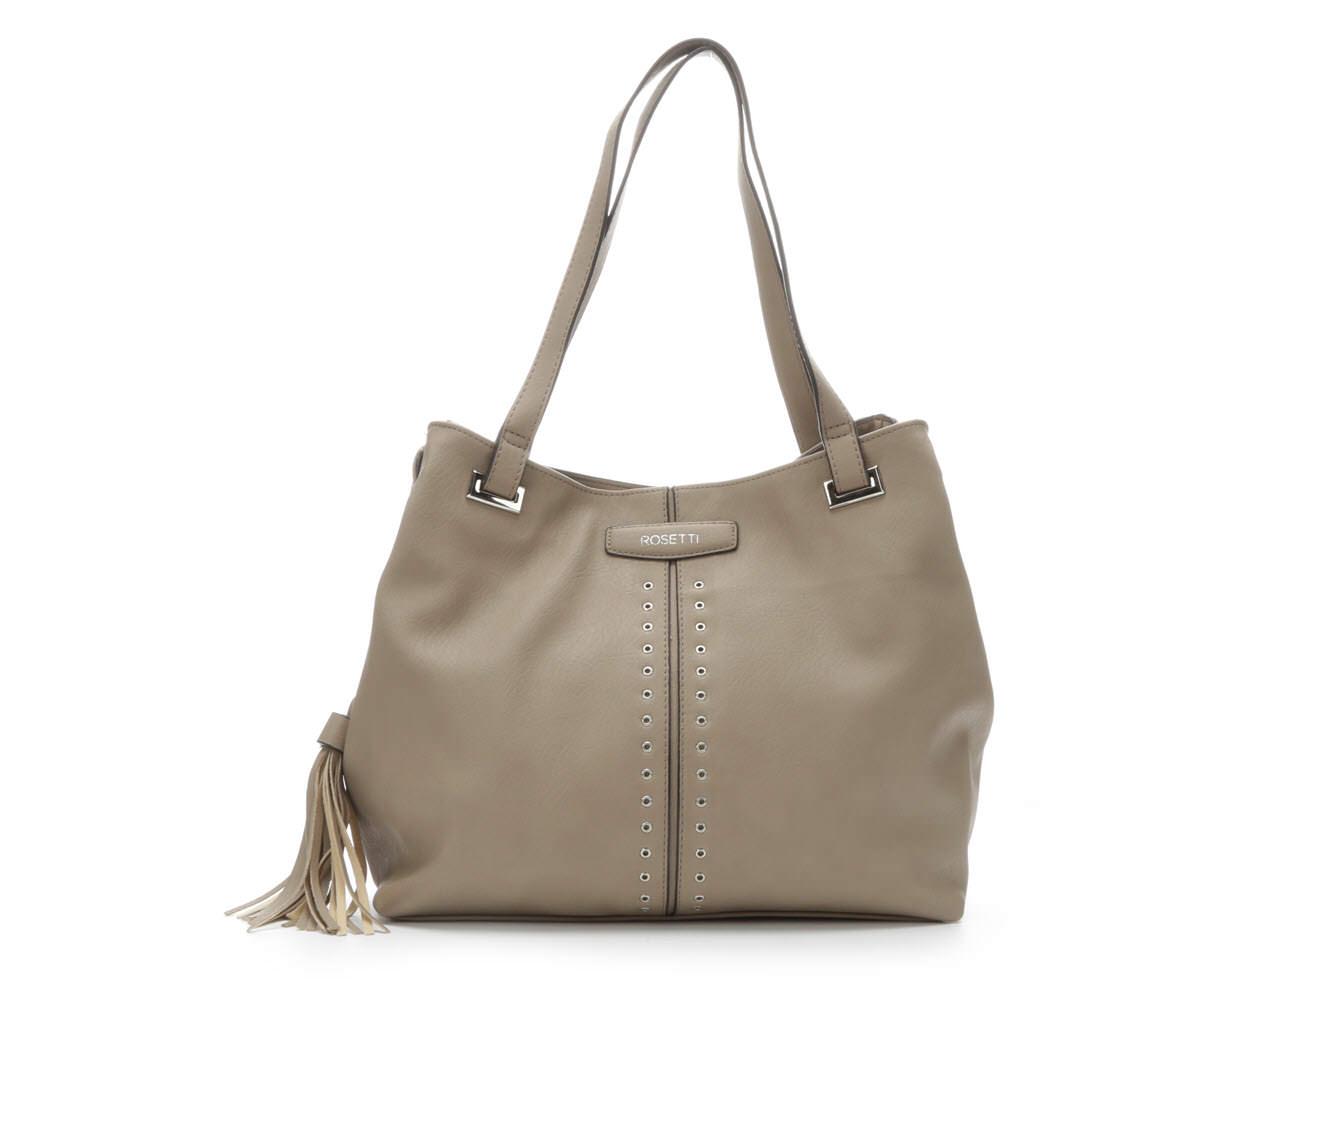 Rosetti Handbags Hunter Hobo Handbag (Beige)